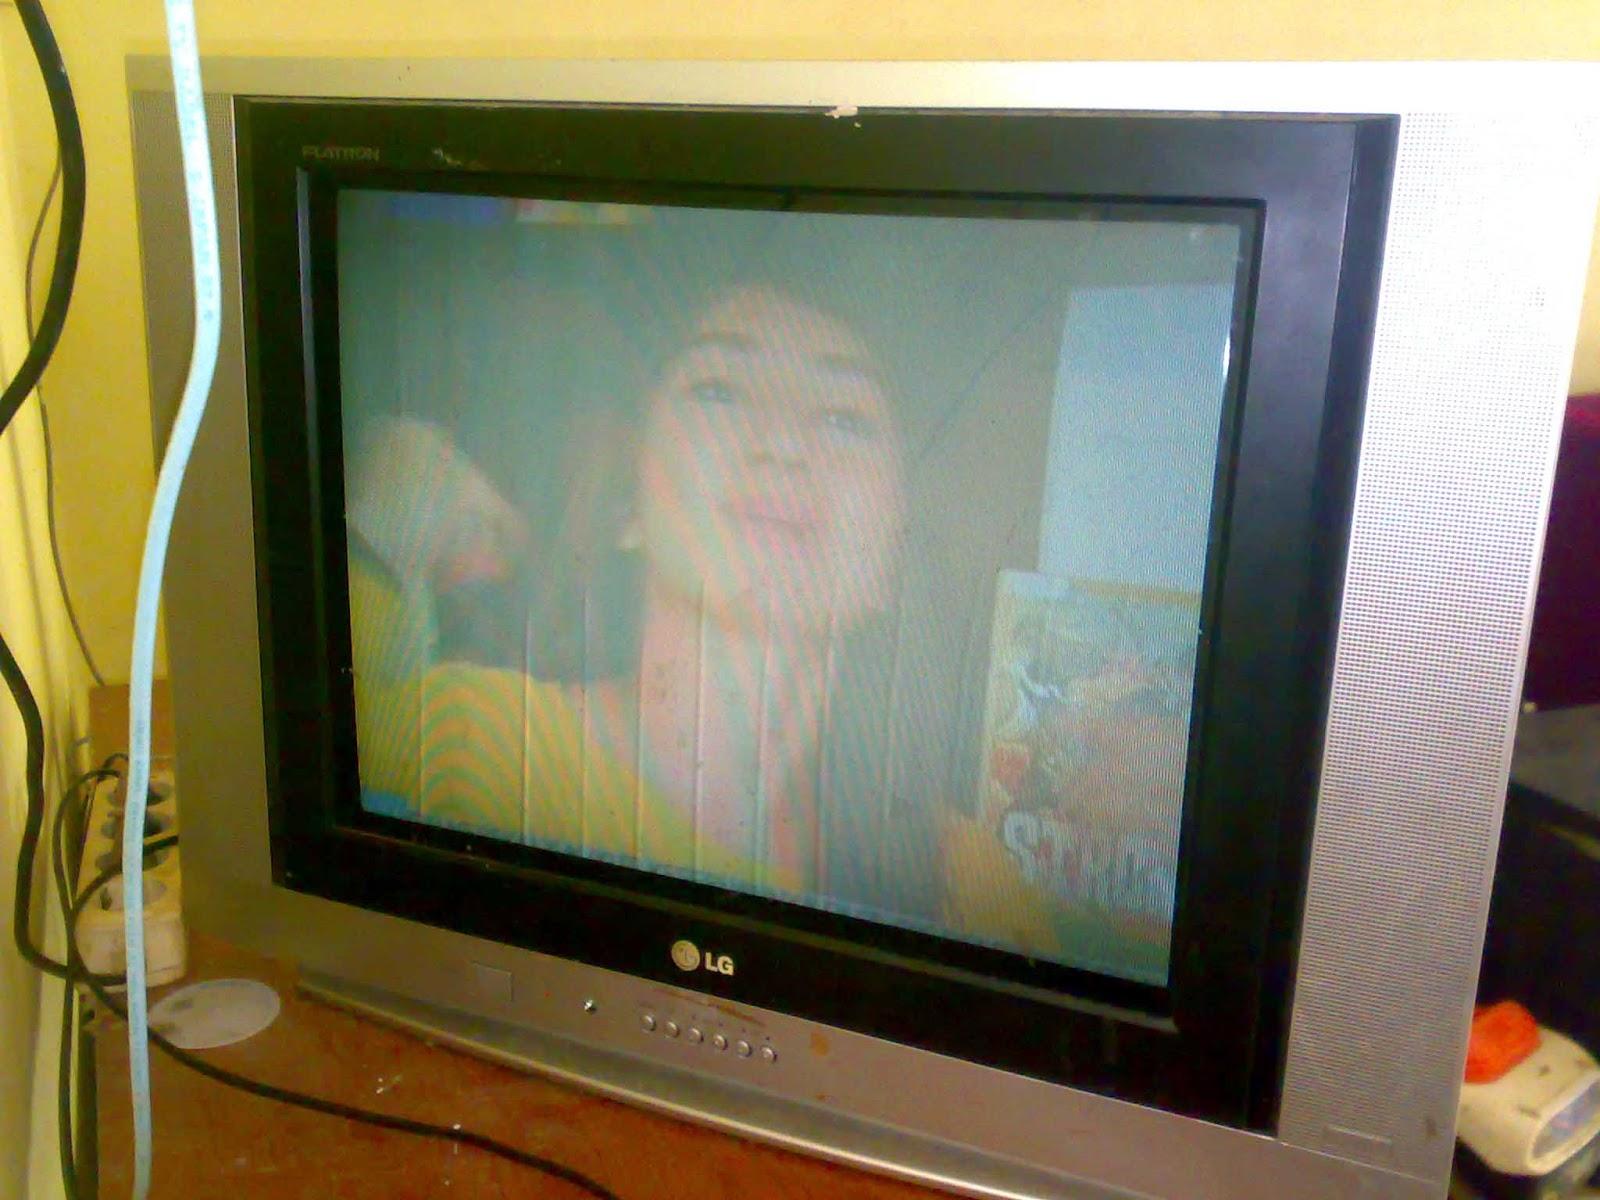 Memperbaiki Tv Lg Gambar Redup Tapi Osd Normal Www Usahahobi Com